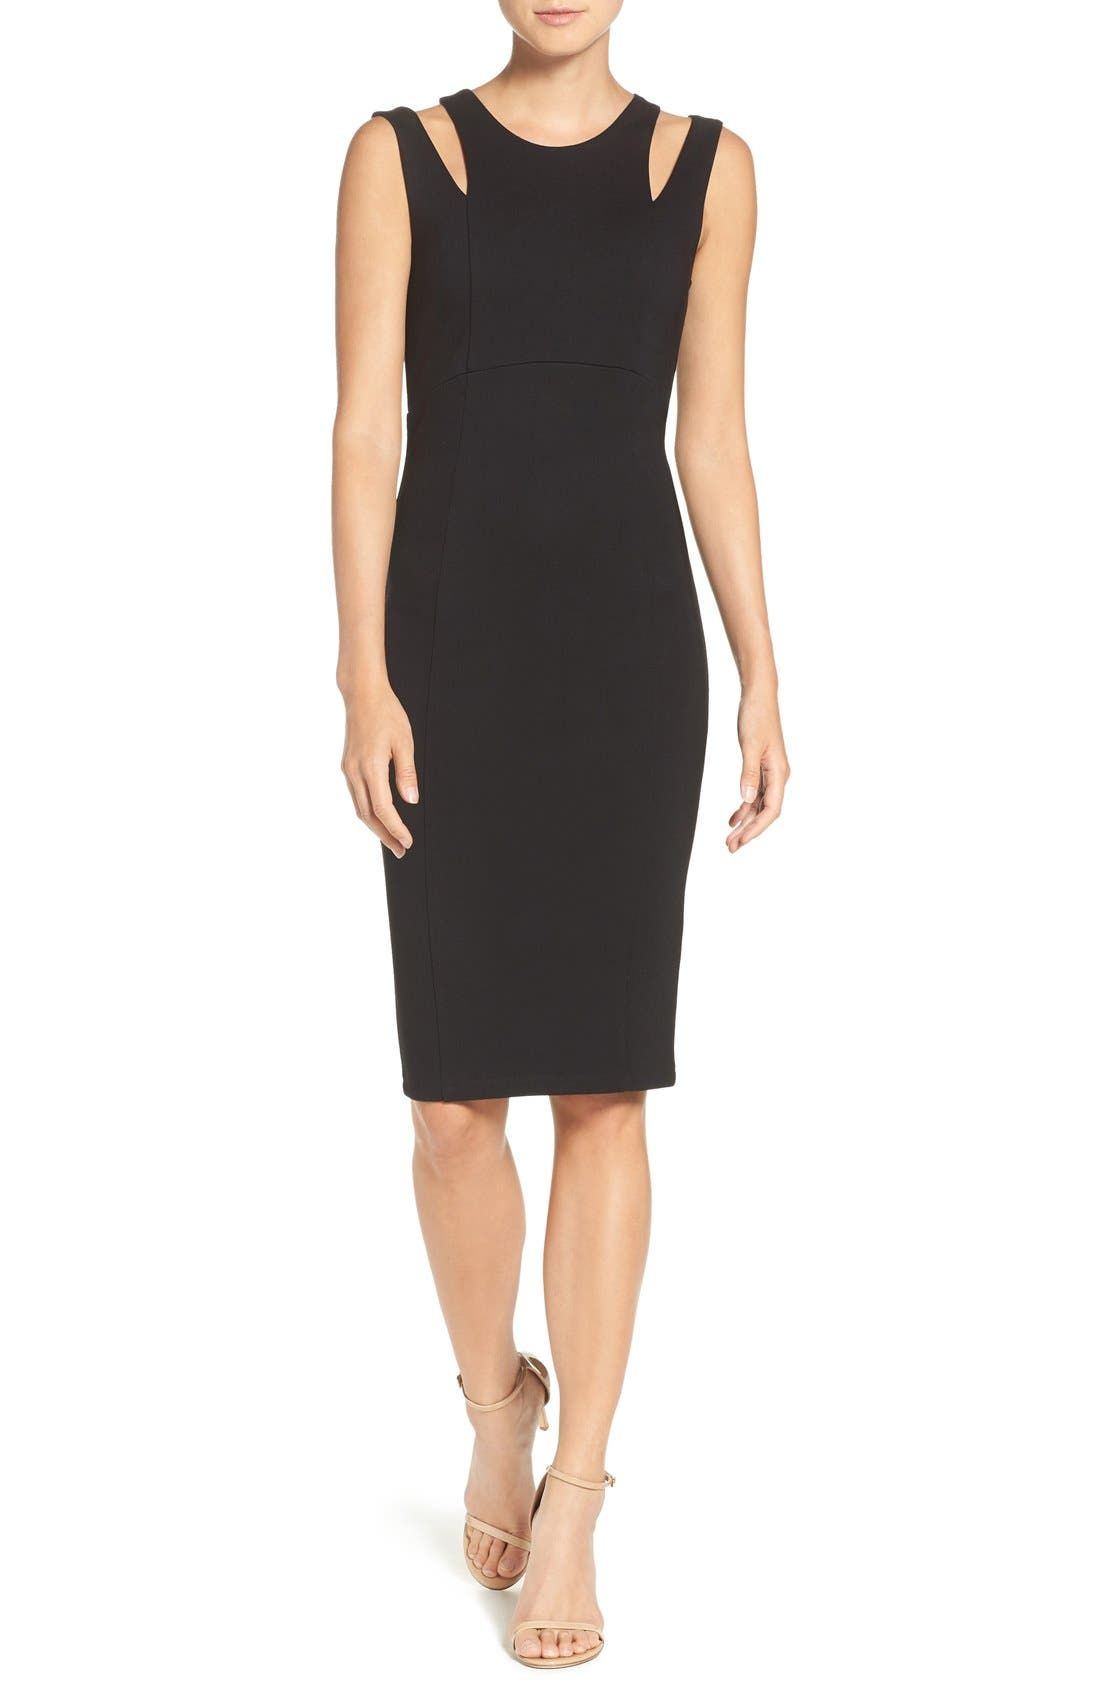 Alternate Image 1 Selected - Felicity & Coco Shoulder Detail Ponte Sheath Dress (Regular & Petite) (Nordstrom Exclusive)